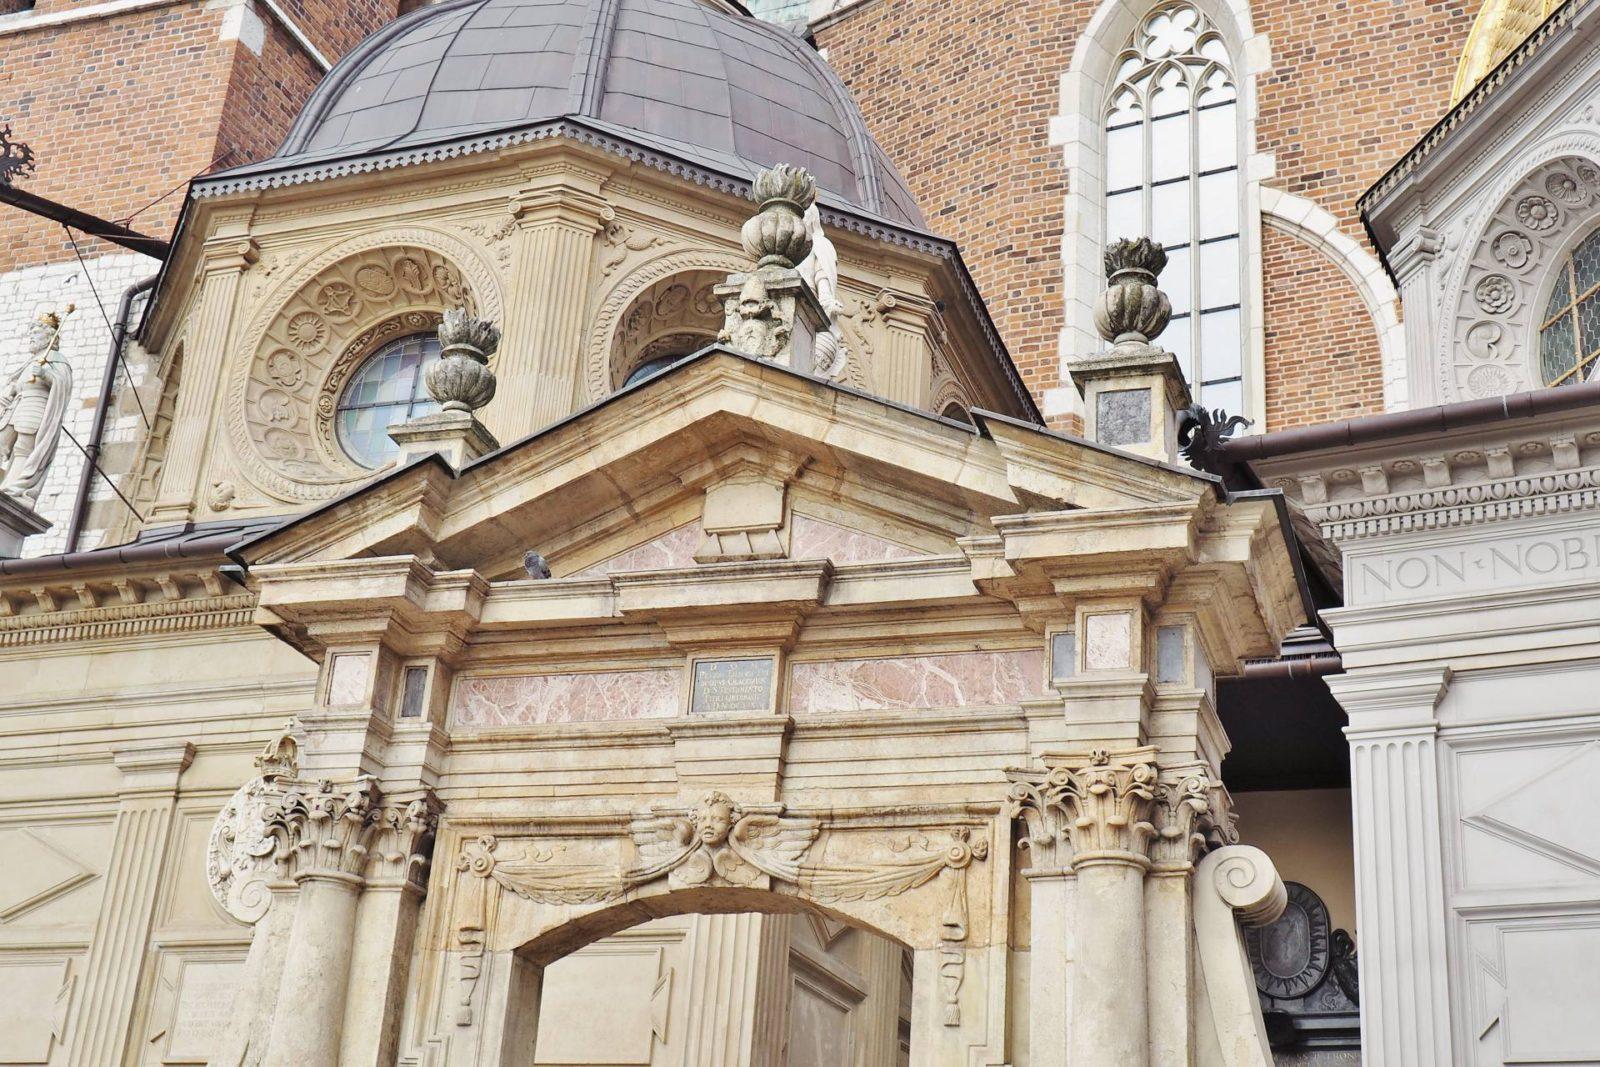 Emma Victoria Stokes Wawel Cathedral Krakow